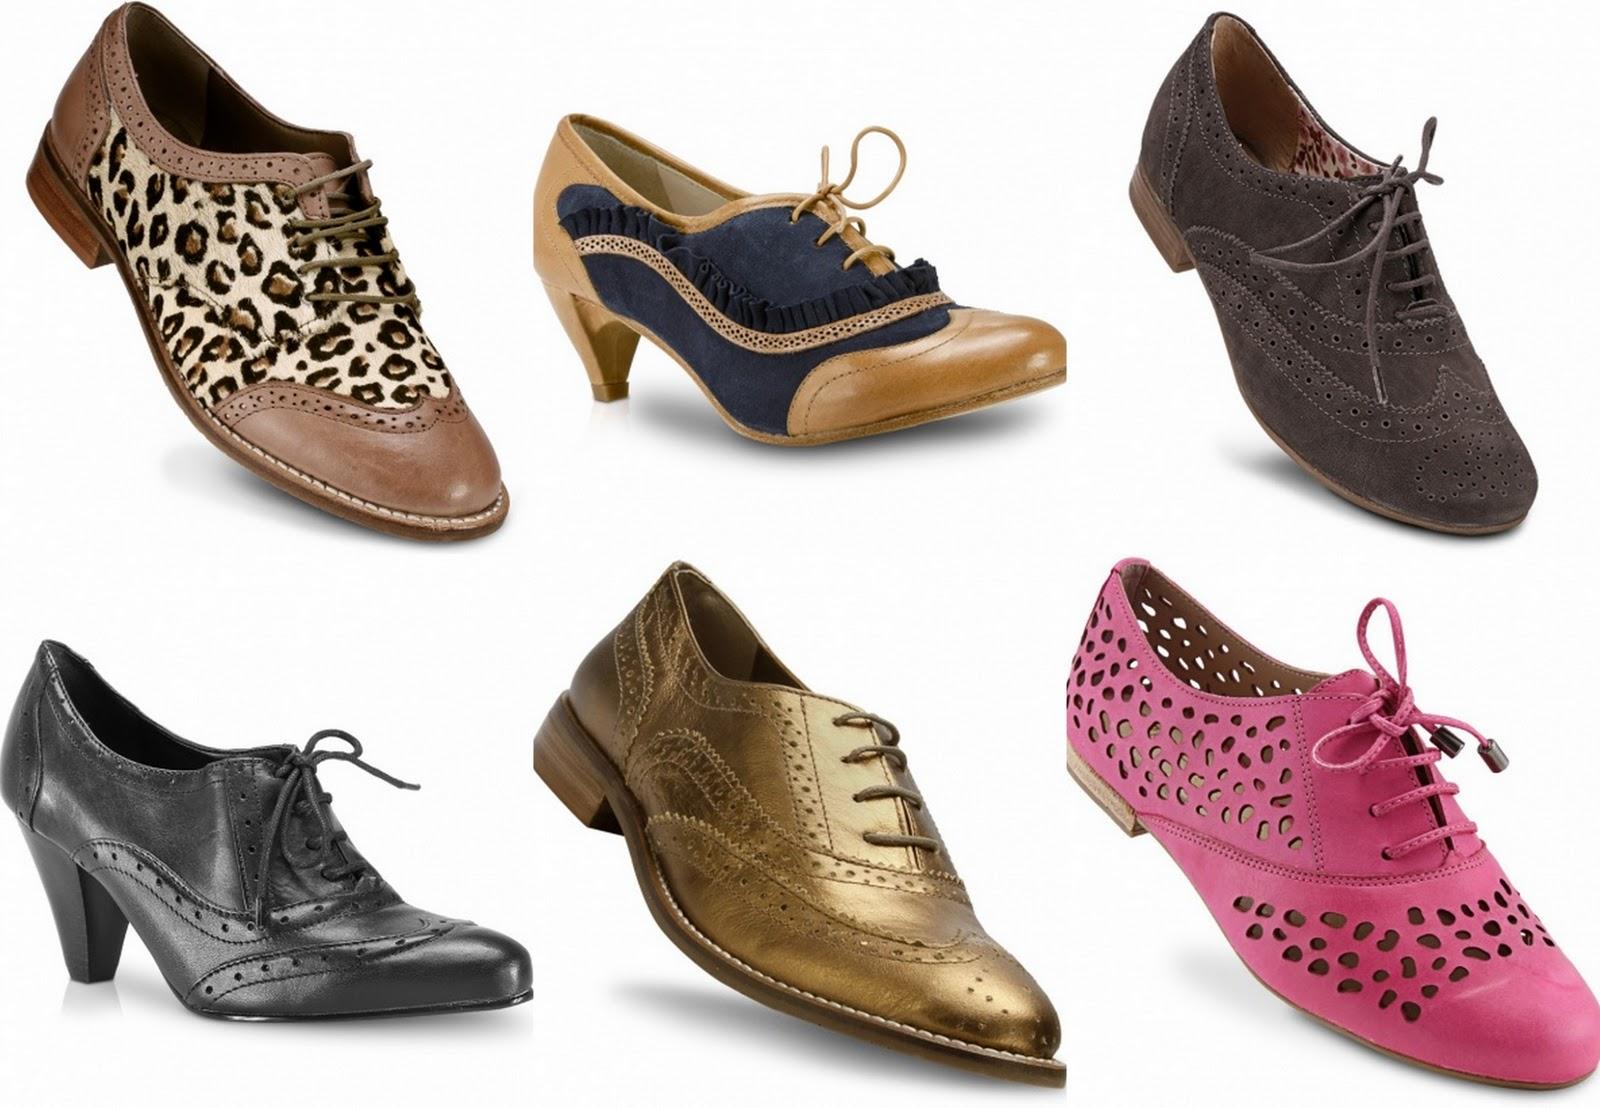 bfa059145f Sapatos femininos